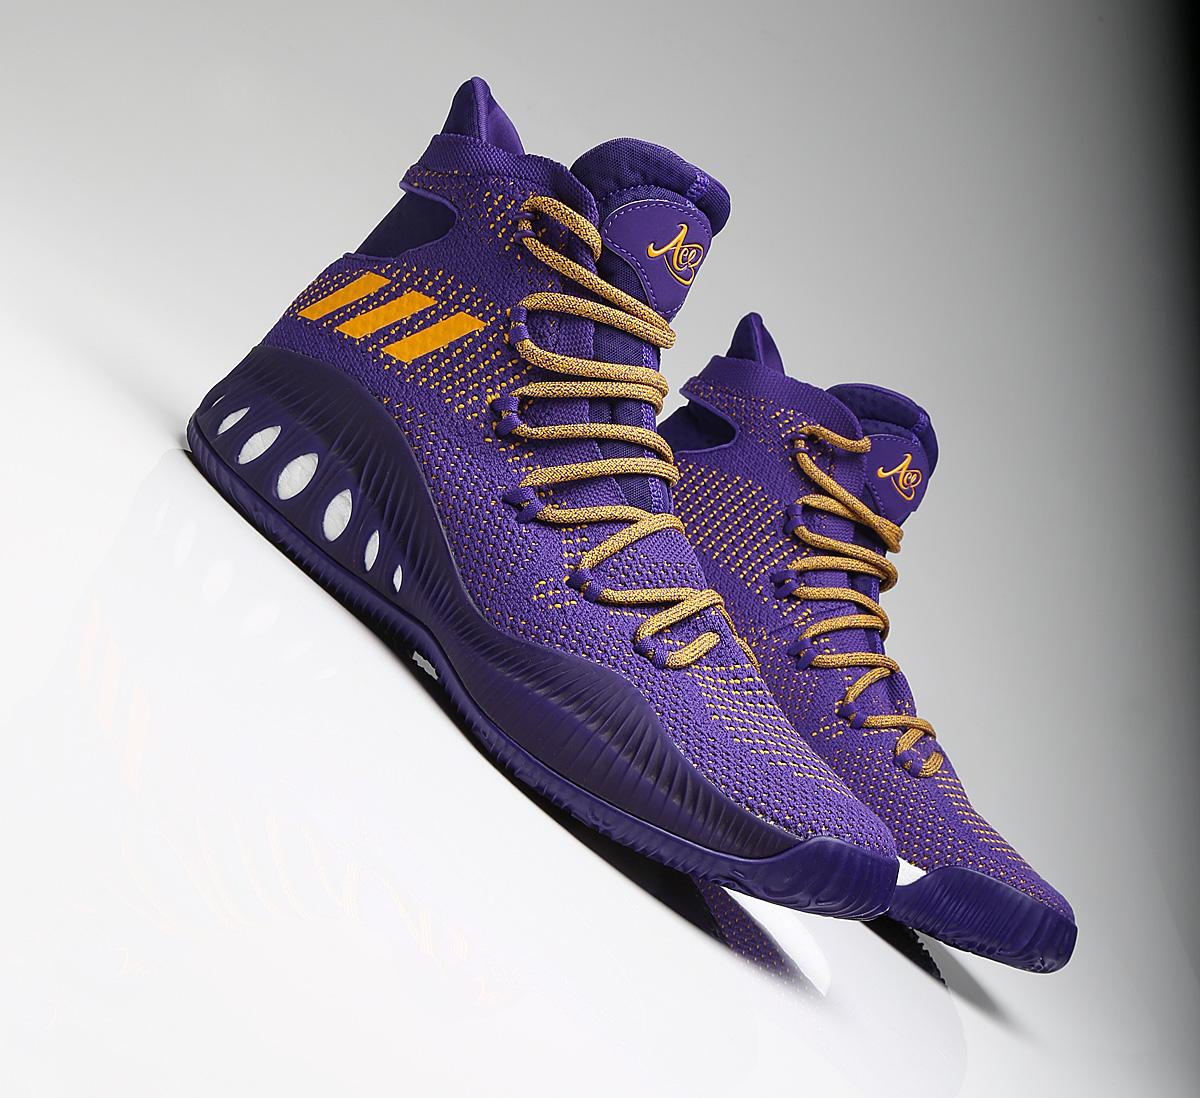 sale retailer dc069 e6679 adidas-crazy-explosive-candace-parker-pe-15-purple